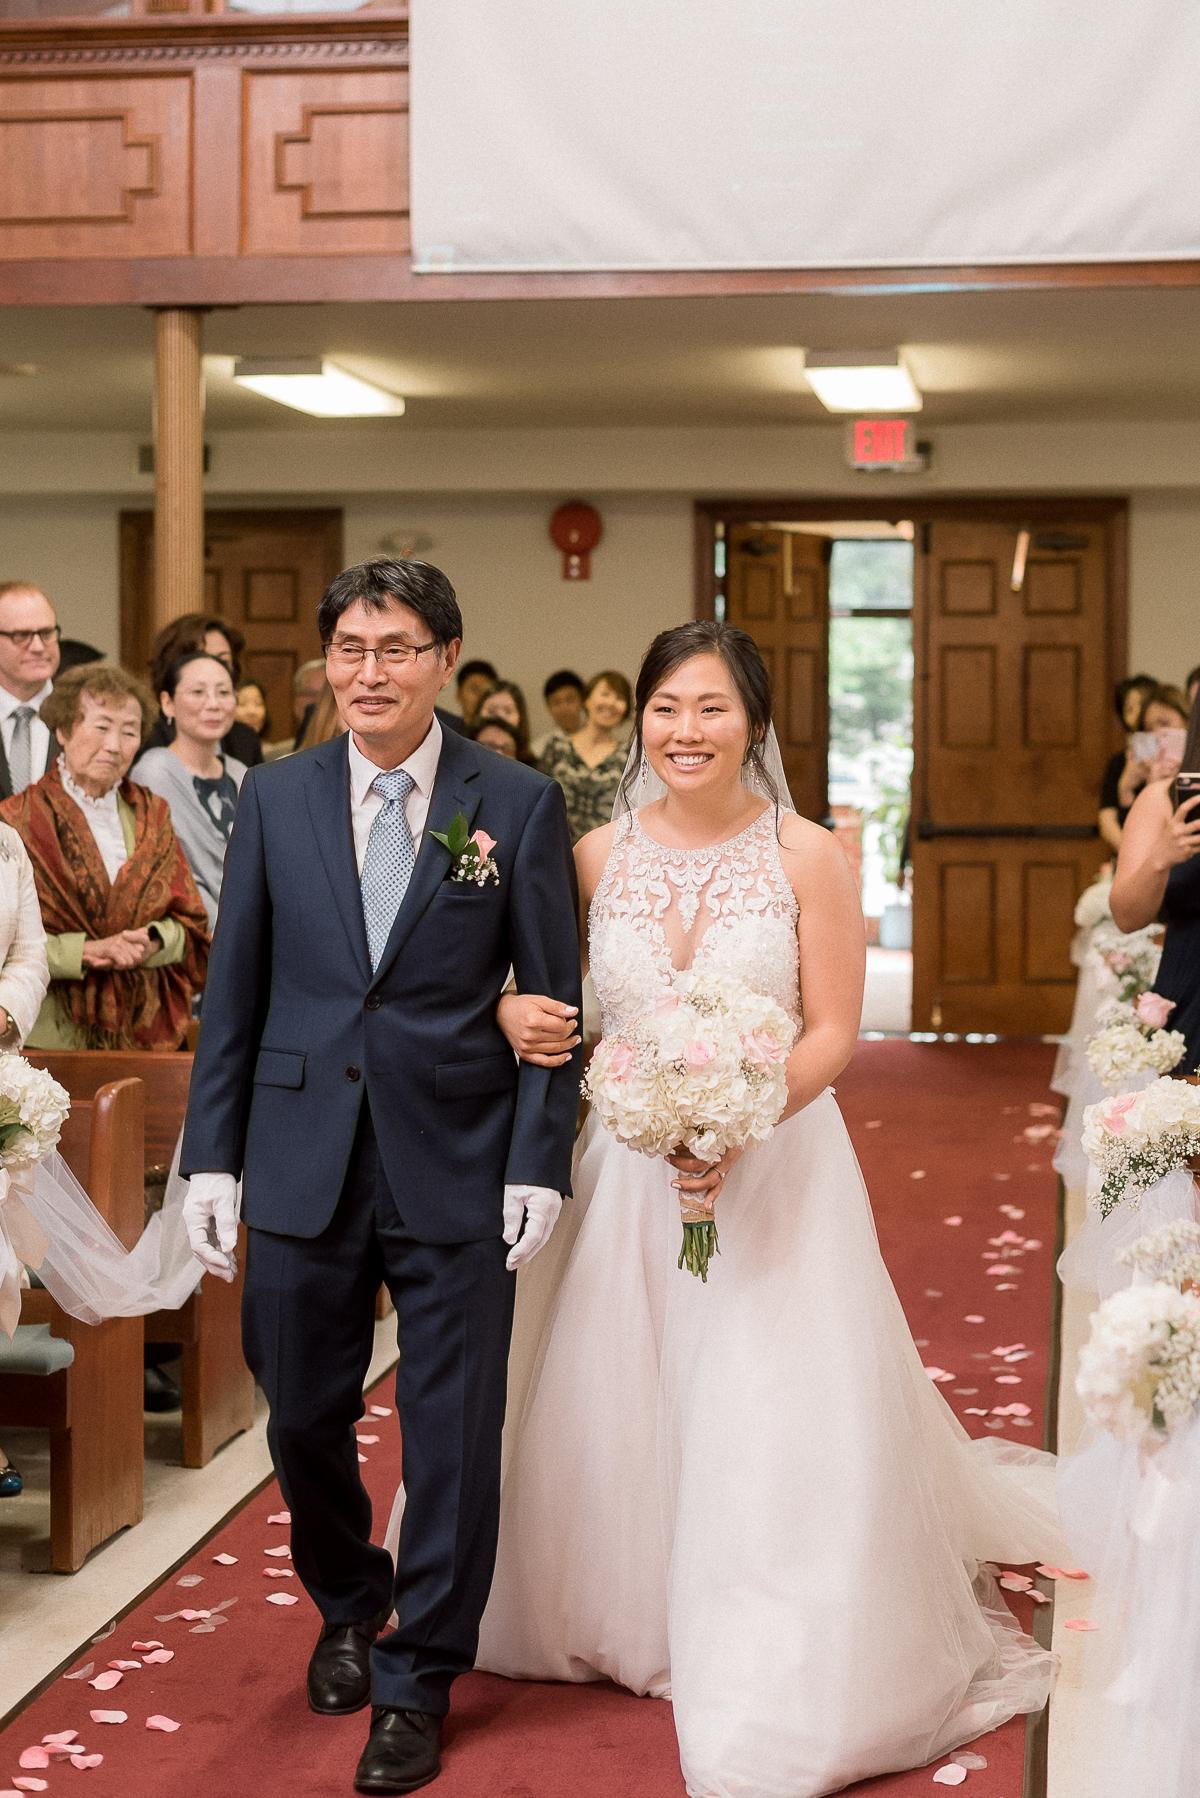 VA-Wedding-Occuqan-Madigan-Waterfront-Bride-Groom-5.jpg